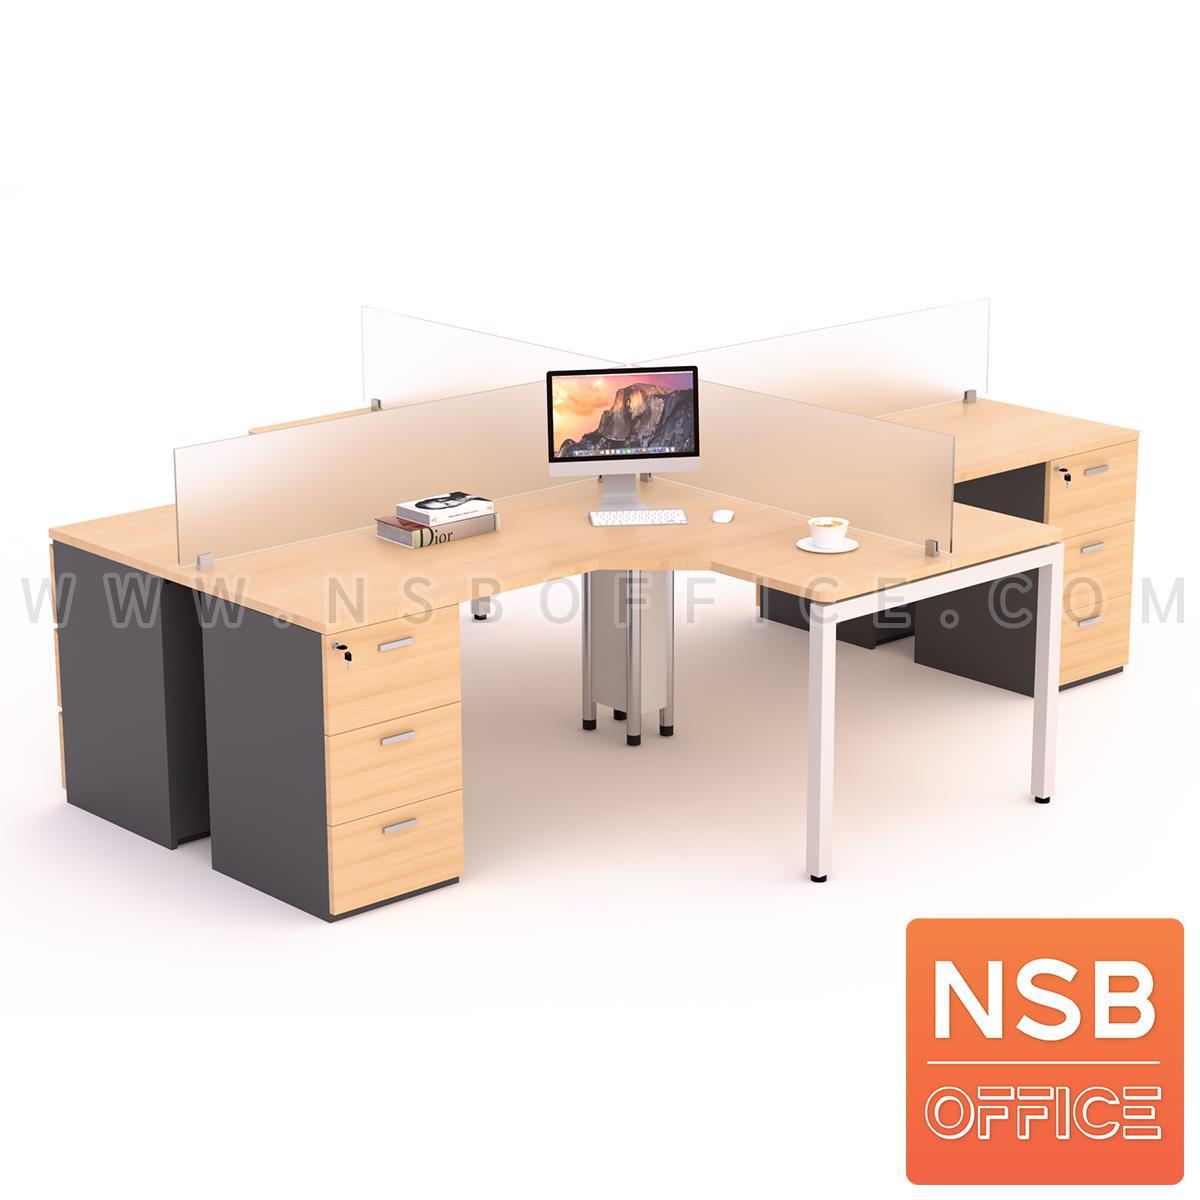 A27A037:โต๊ะทำงานกลุ่มตัวแอล 4 ที่นั่ง  พร้อมลิ้นชัก 3 ลิ้นชัก ขาเหล็กกล่อง